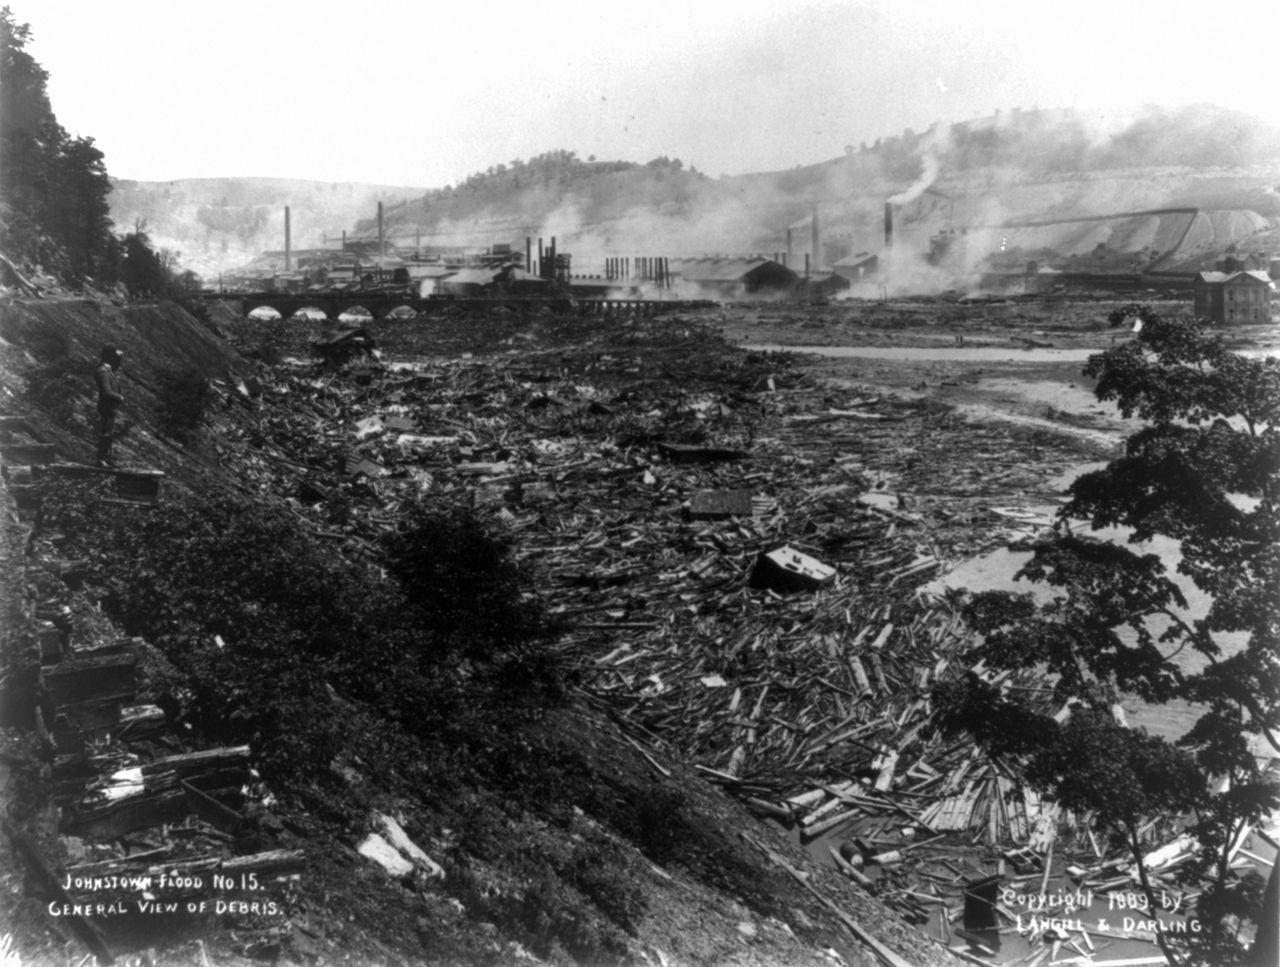 The Debris Field Below Johnstown